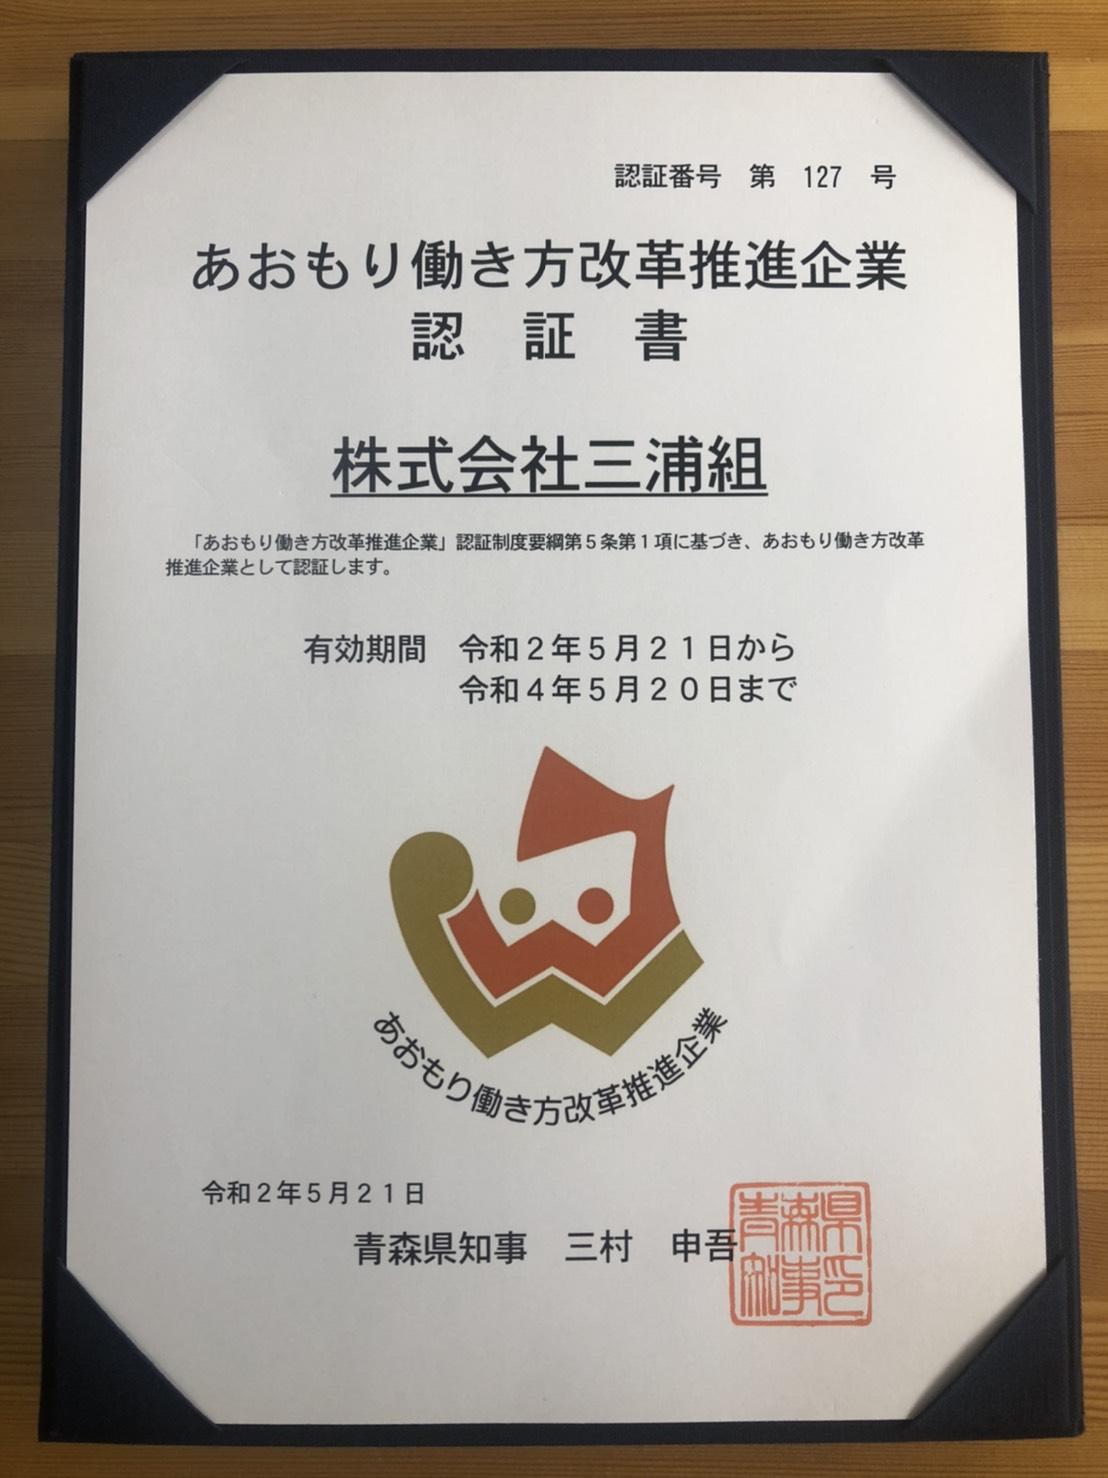 働き方改革推進企業 三浦組